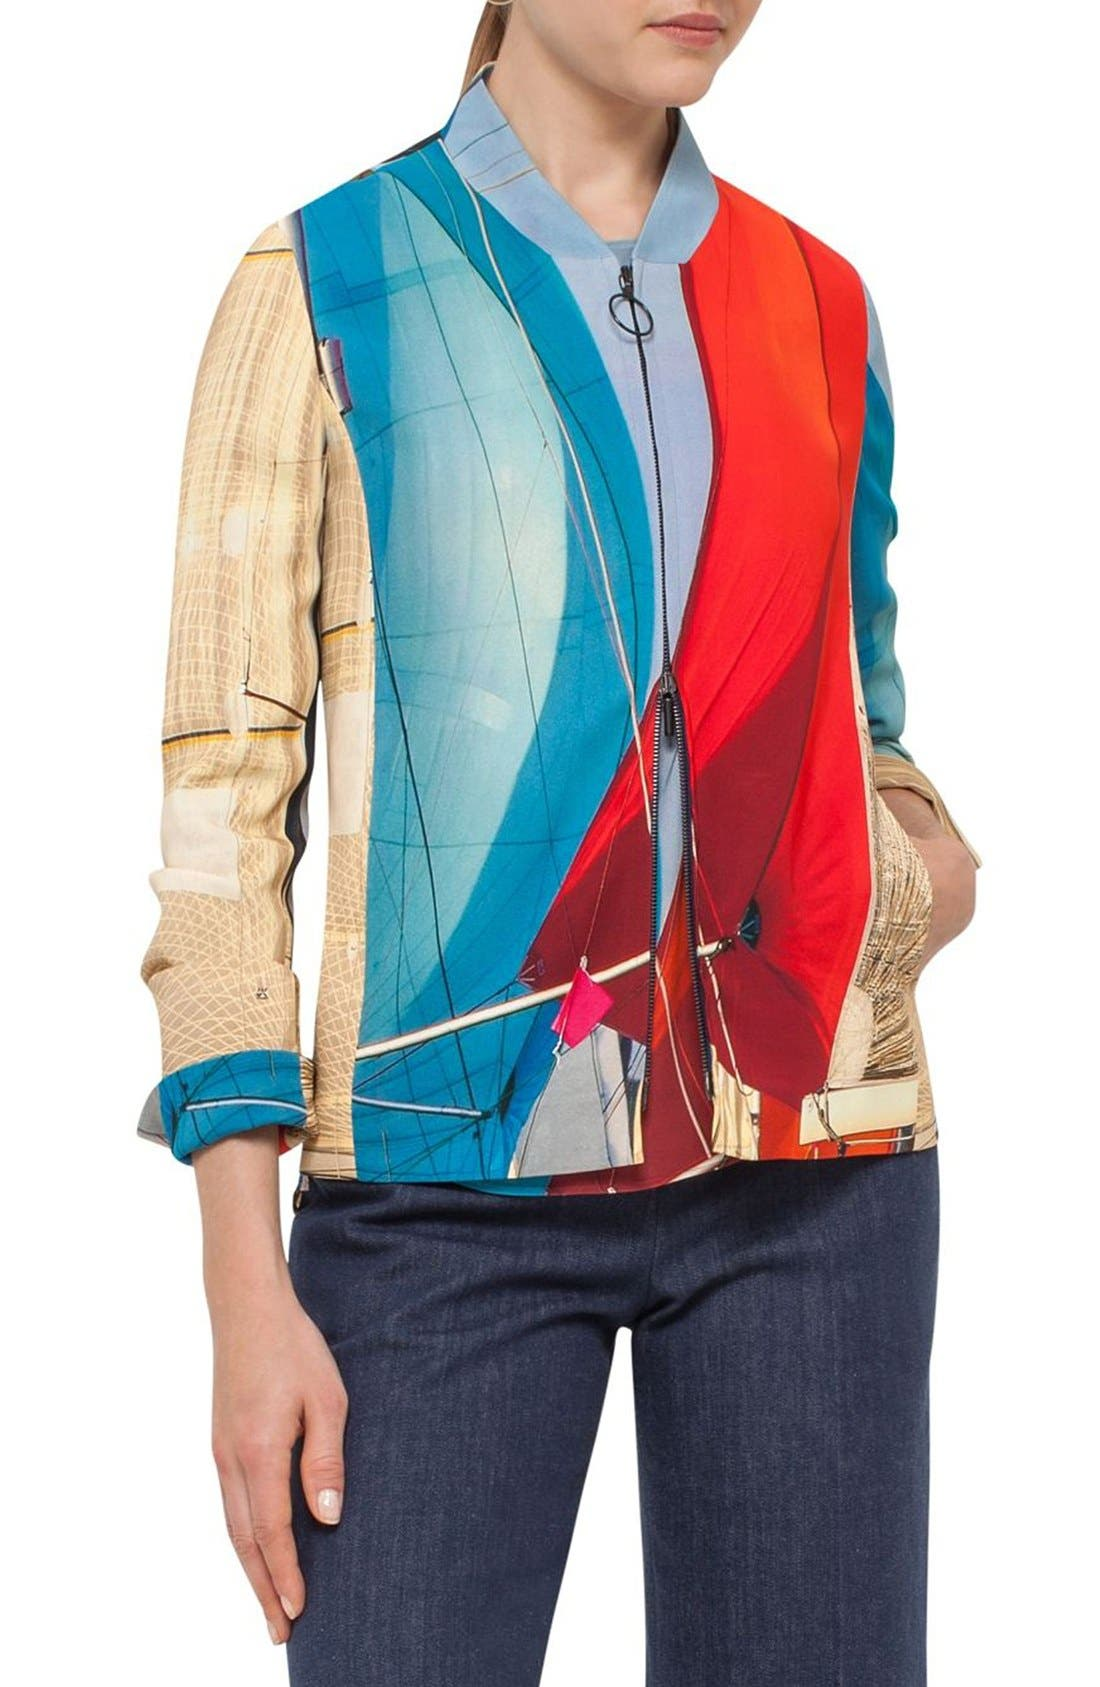 AKRIS PUNTO 'Mainsail' Print Crepe Bomber Jacket